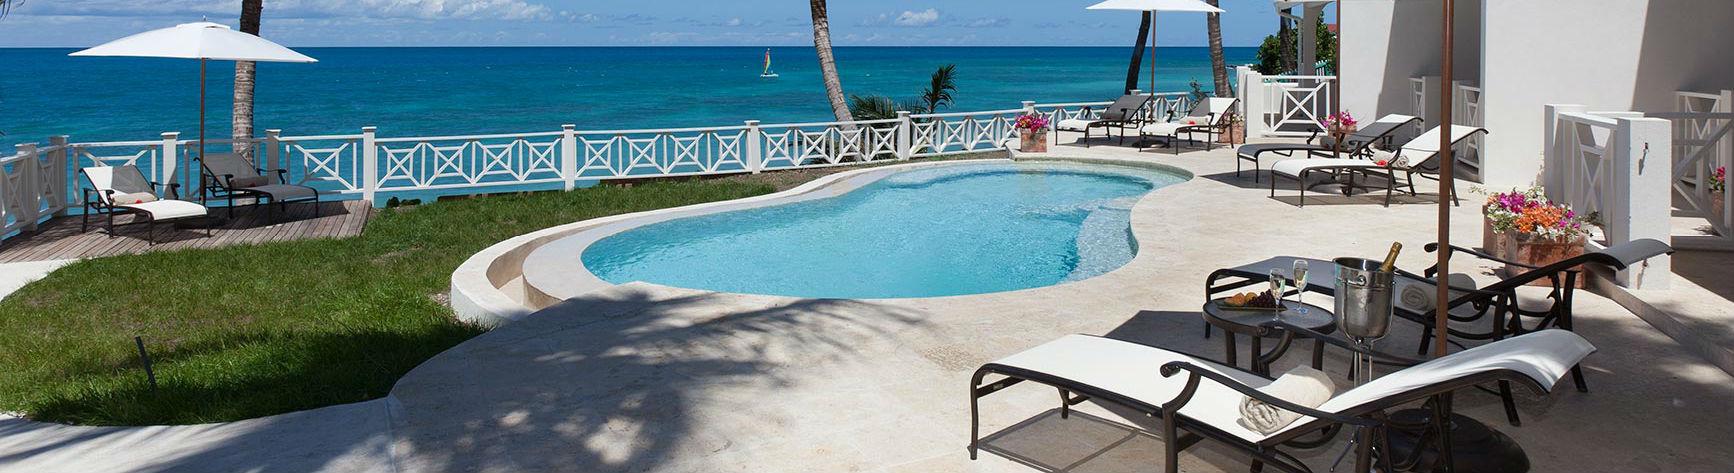 Pelican-House 2 Blue Waters Antigua